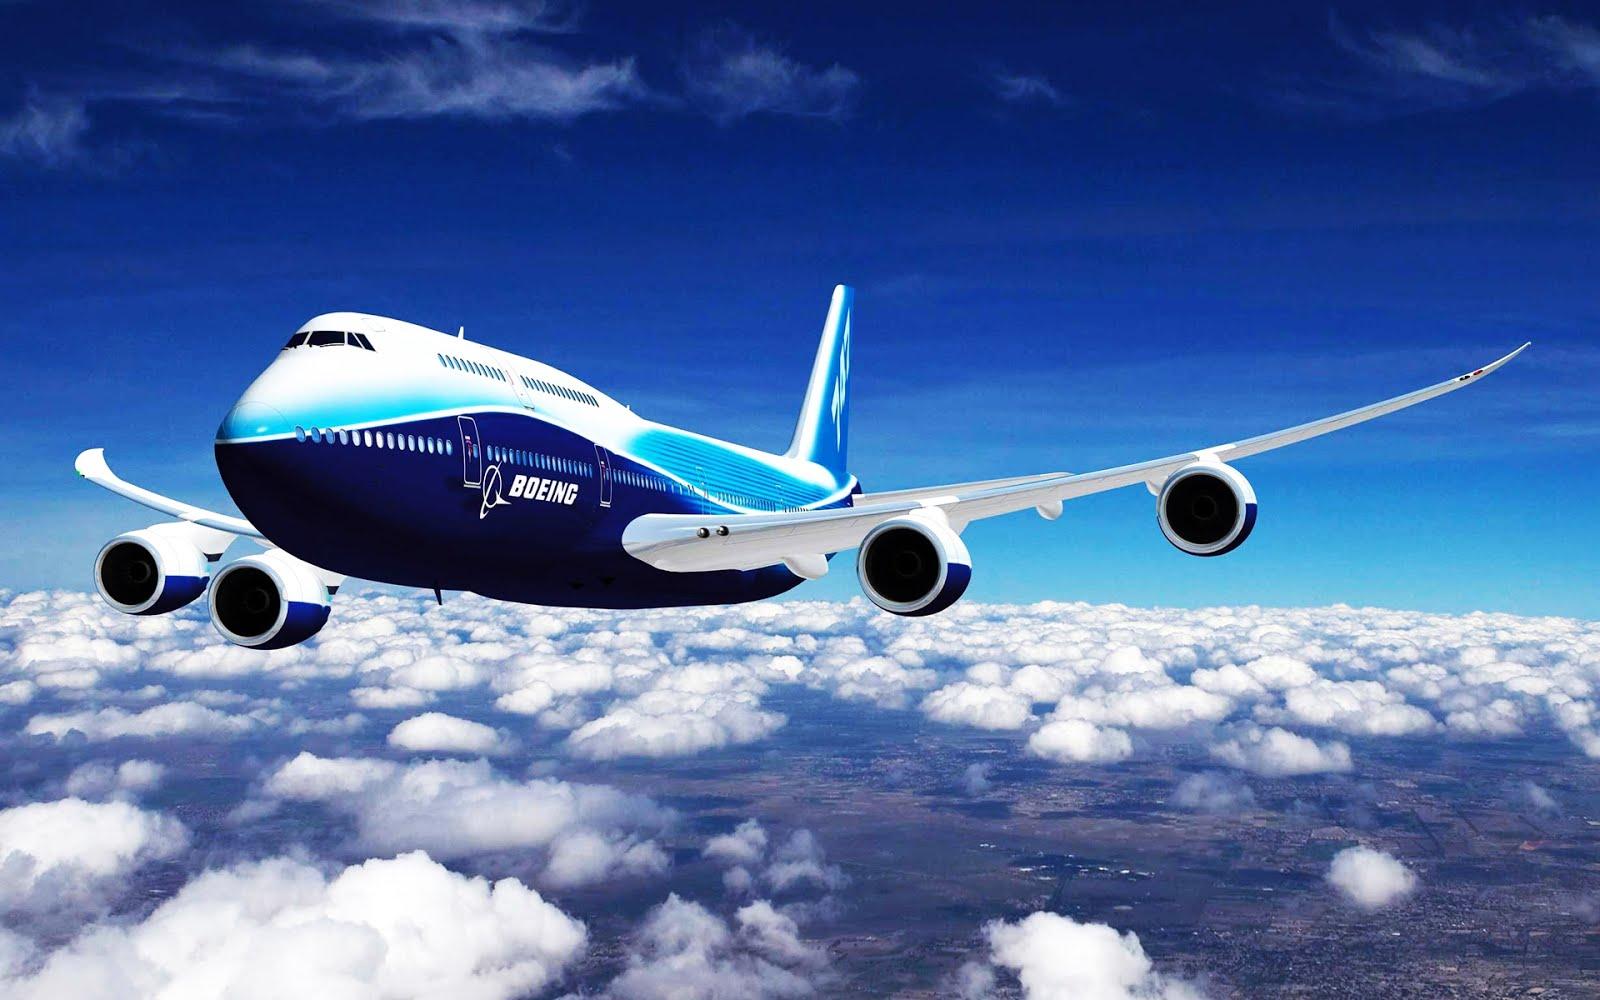 http://1.bp.blogspot.com/-oJHI_Uofe-M/UIlvGR0gzDI/AAAAAAABMus/qv30ihpl4vE/s1600/boeing-747-8-1920x1200-wallpaper-aviones-enormes-de-super-lujo.jpg